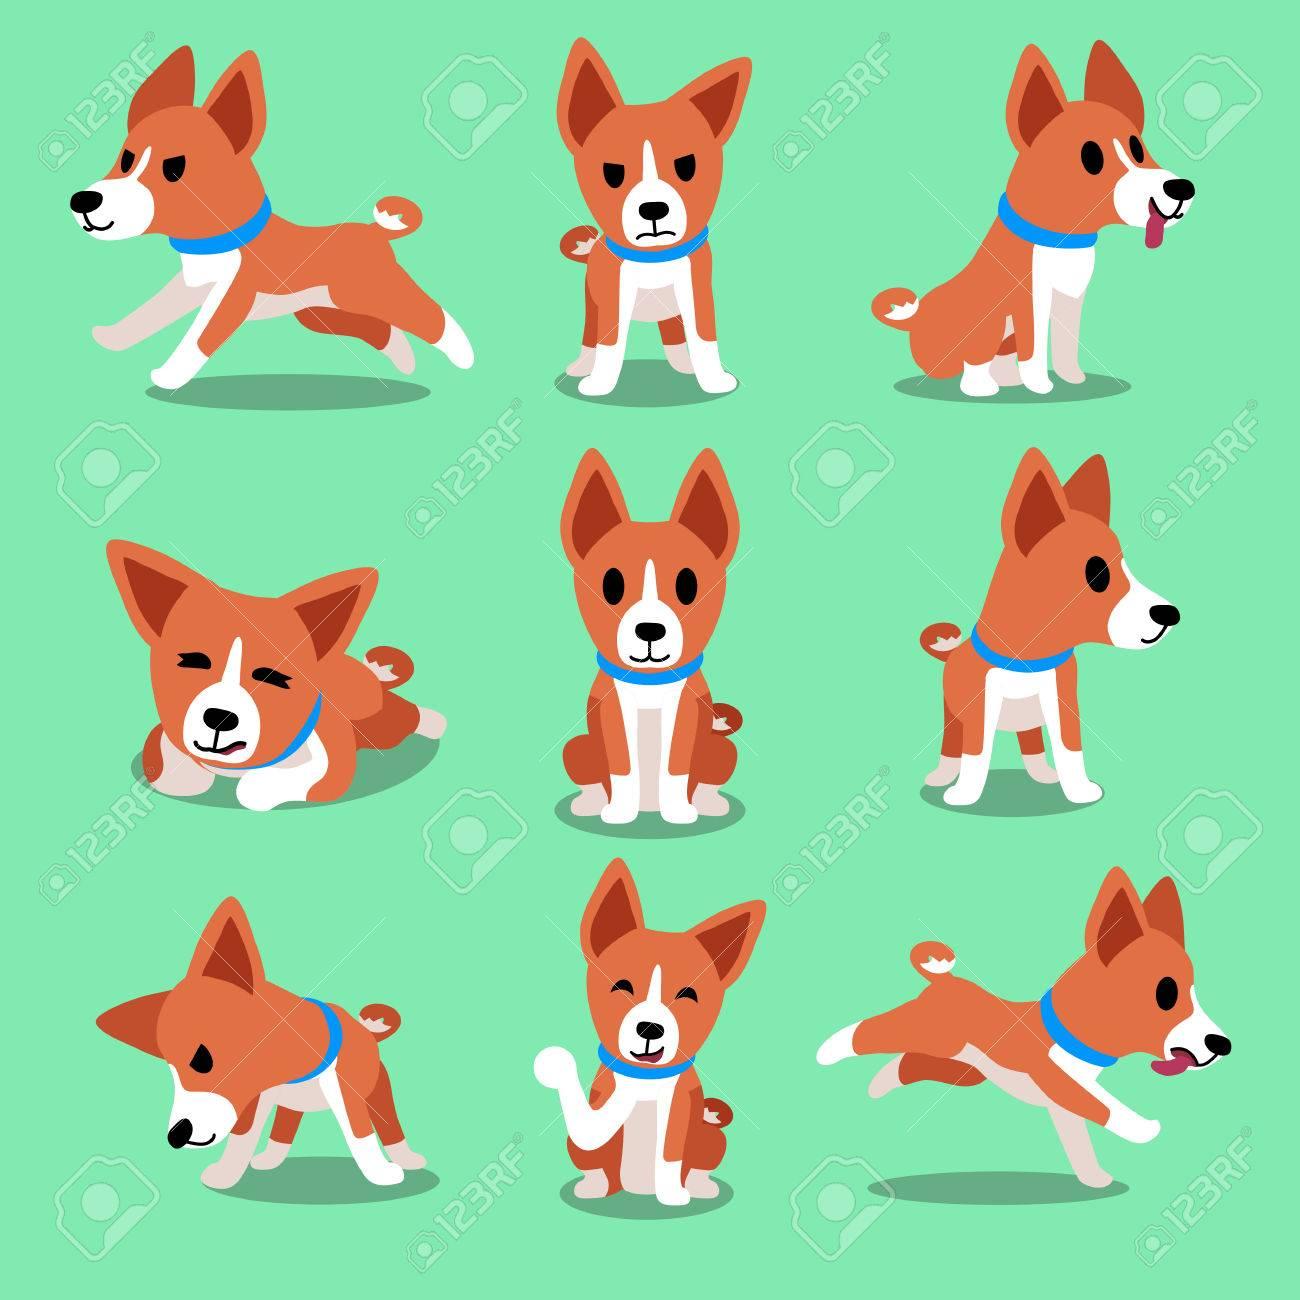 Cartoon character basenji dog poses - 55807631